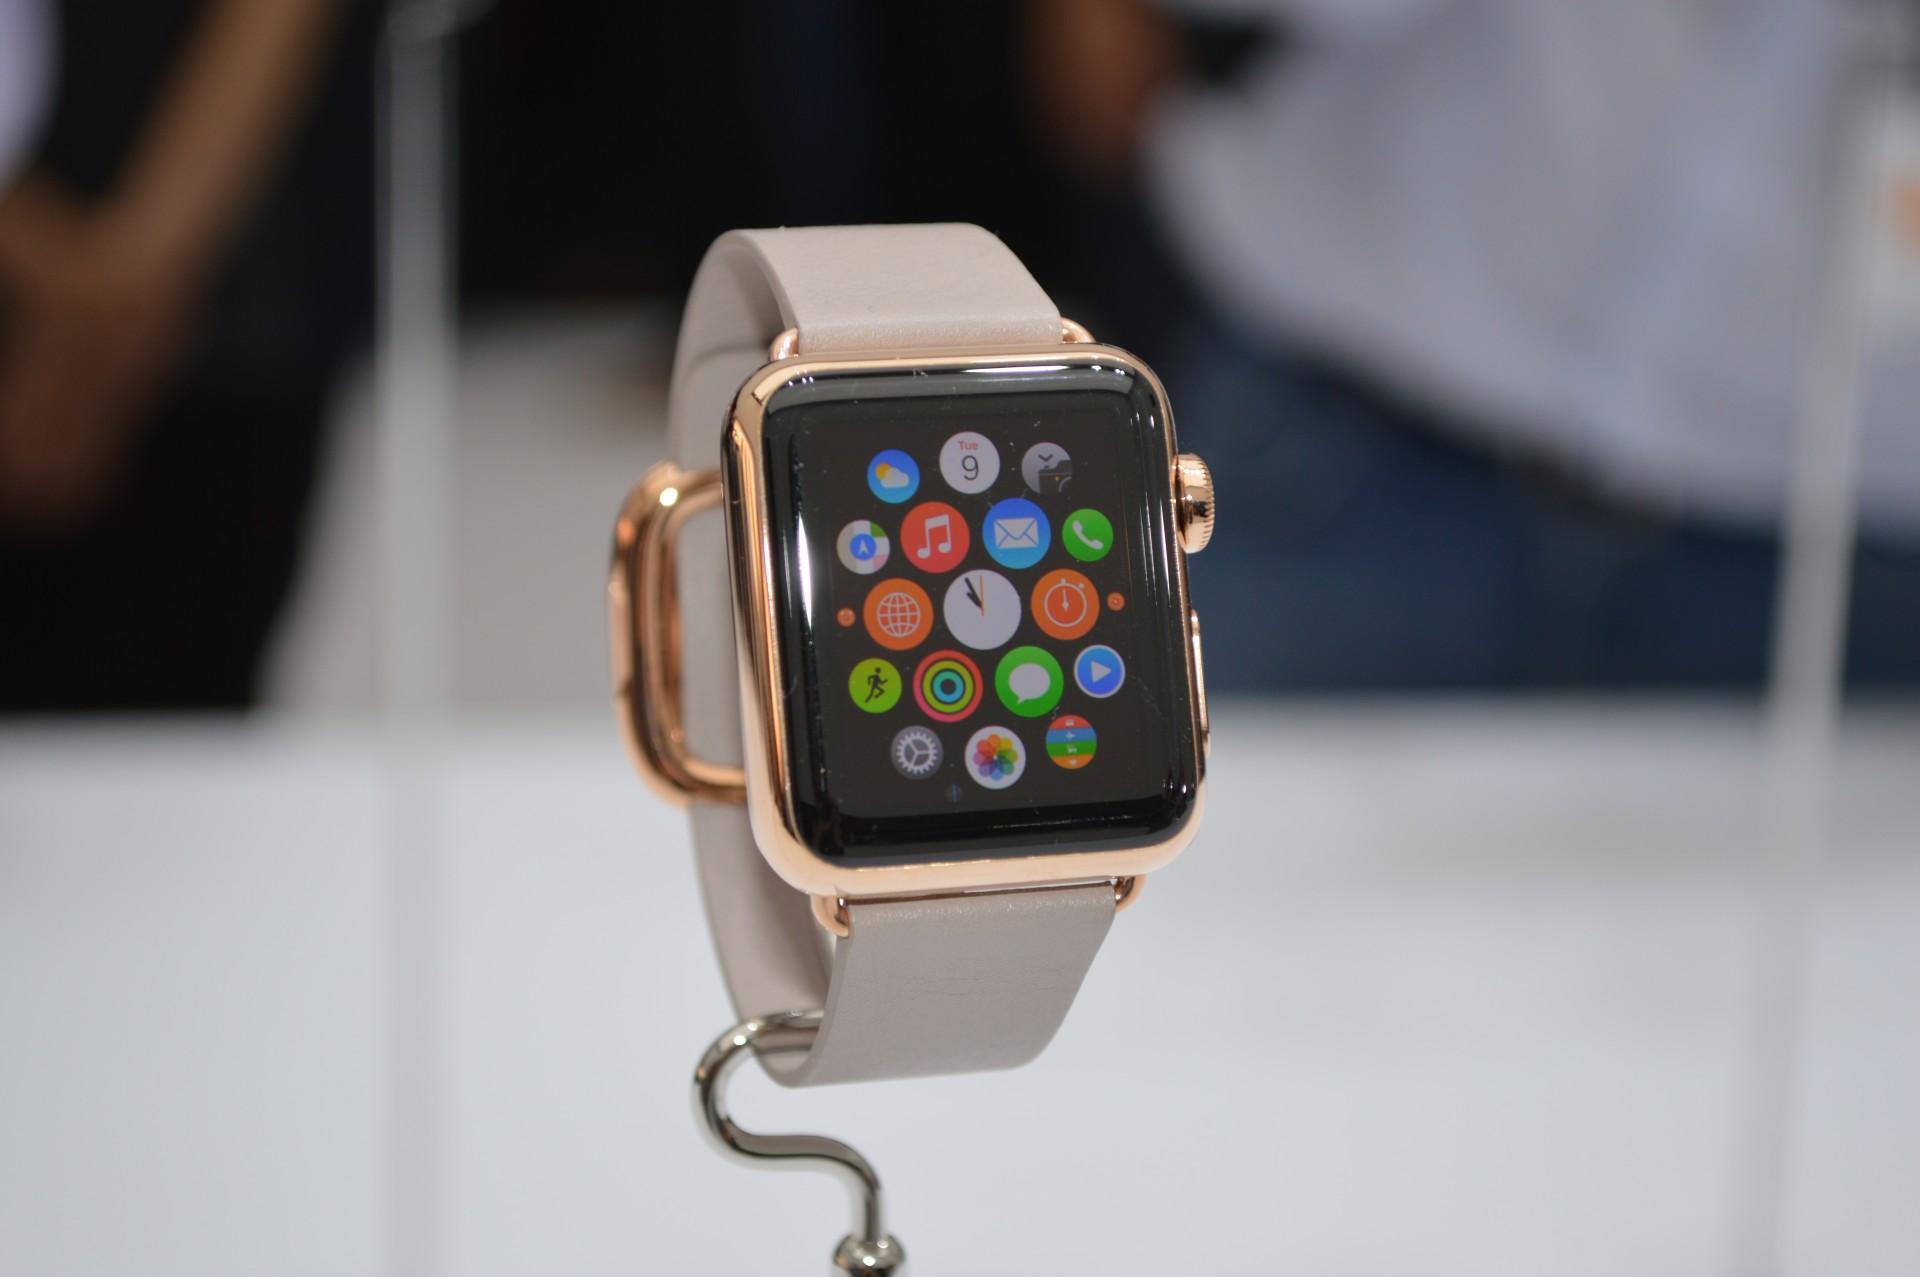 Iwatch 4 Price